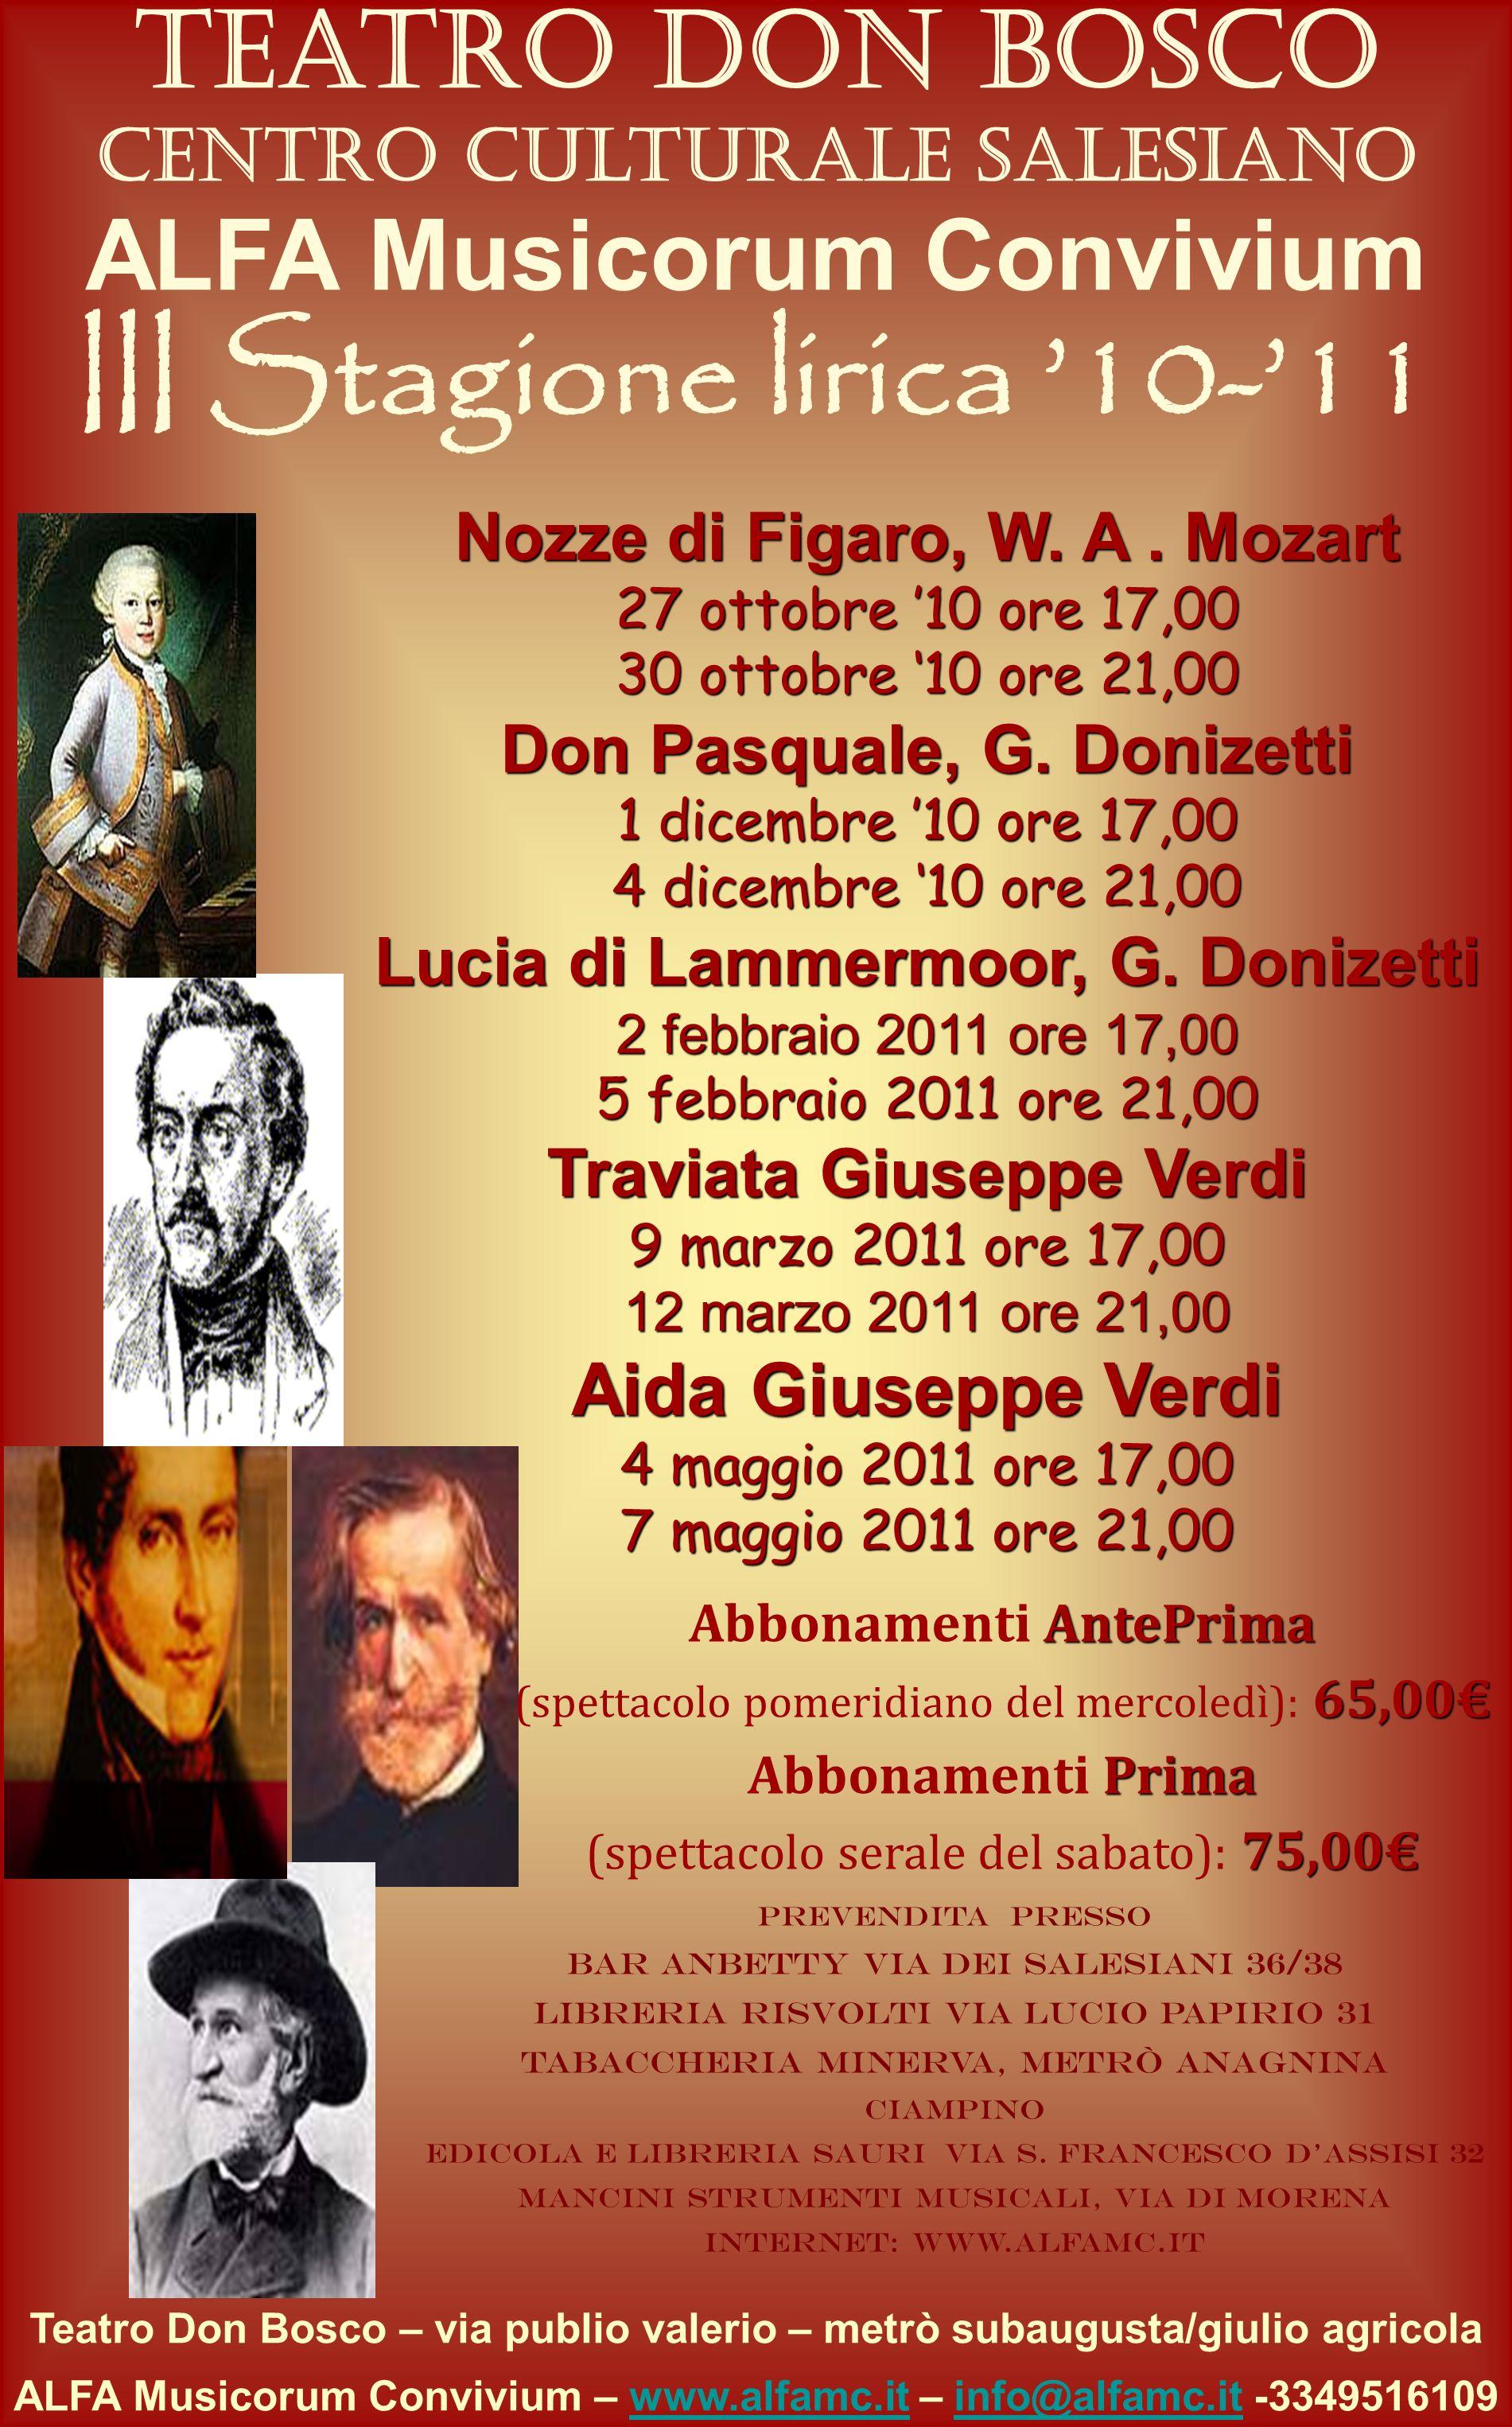 Teatro Don Bosco Centro Culturale Salesiano ALFA Musicorum Convivium III Stagione lirica 10-11 Teatro Don Bosco – via publio valerio – metrò subaugust